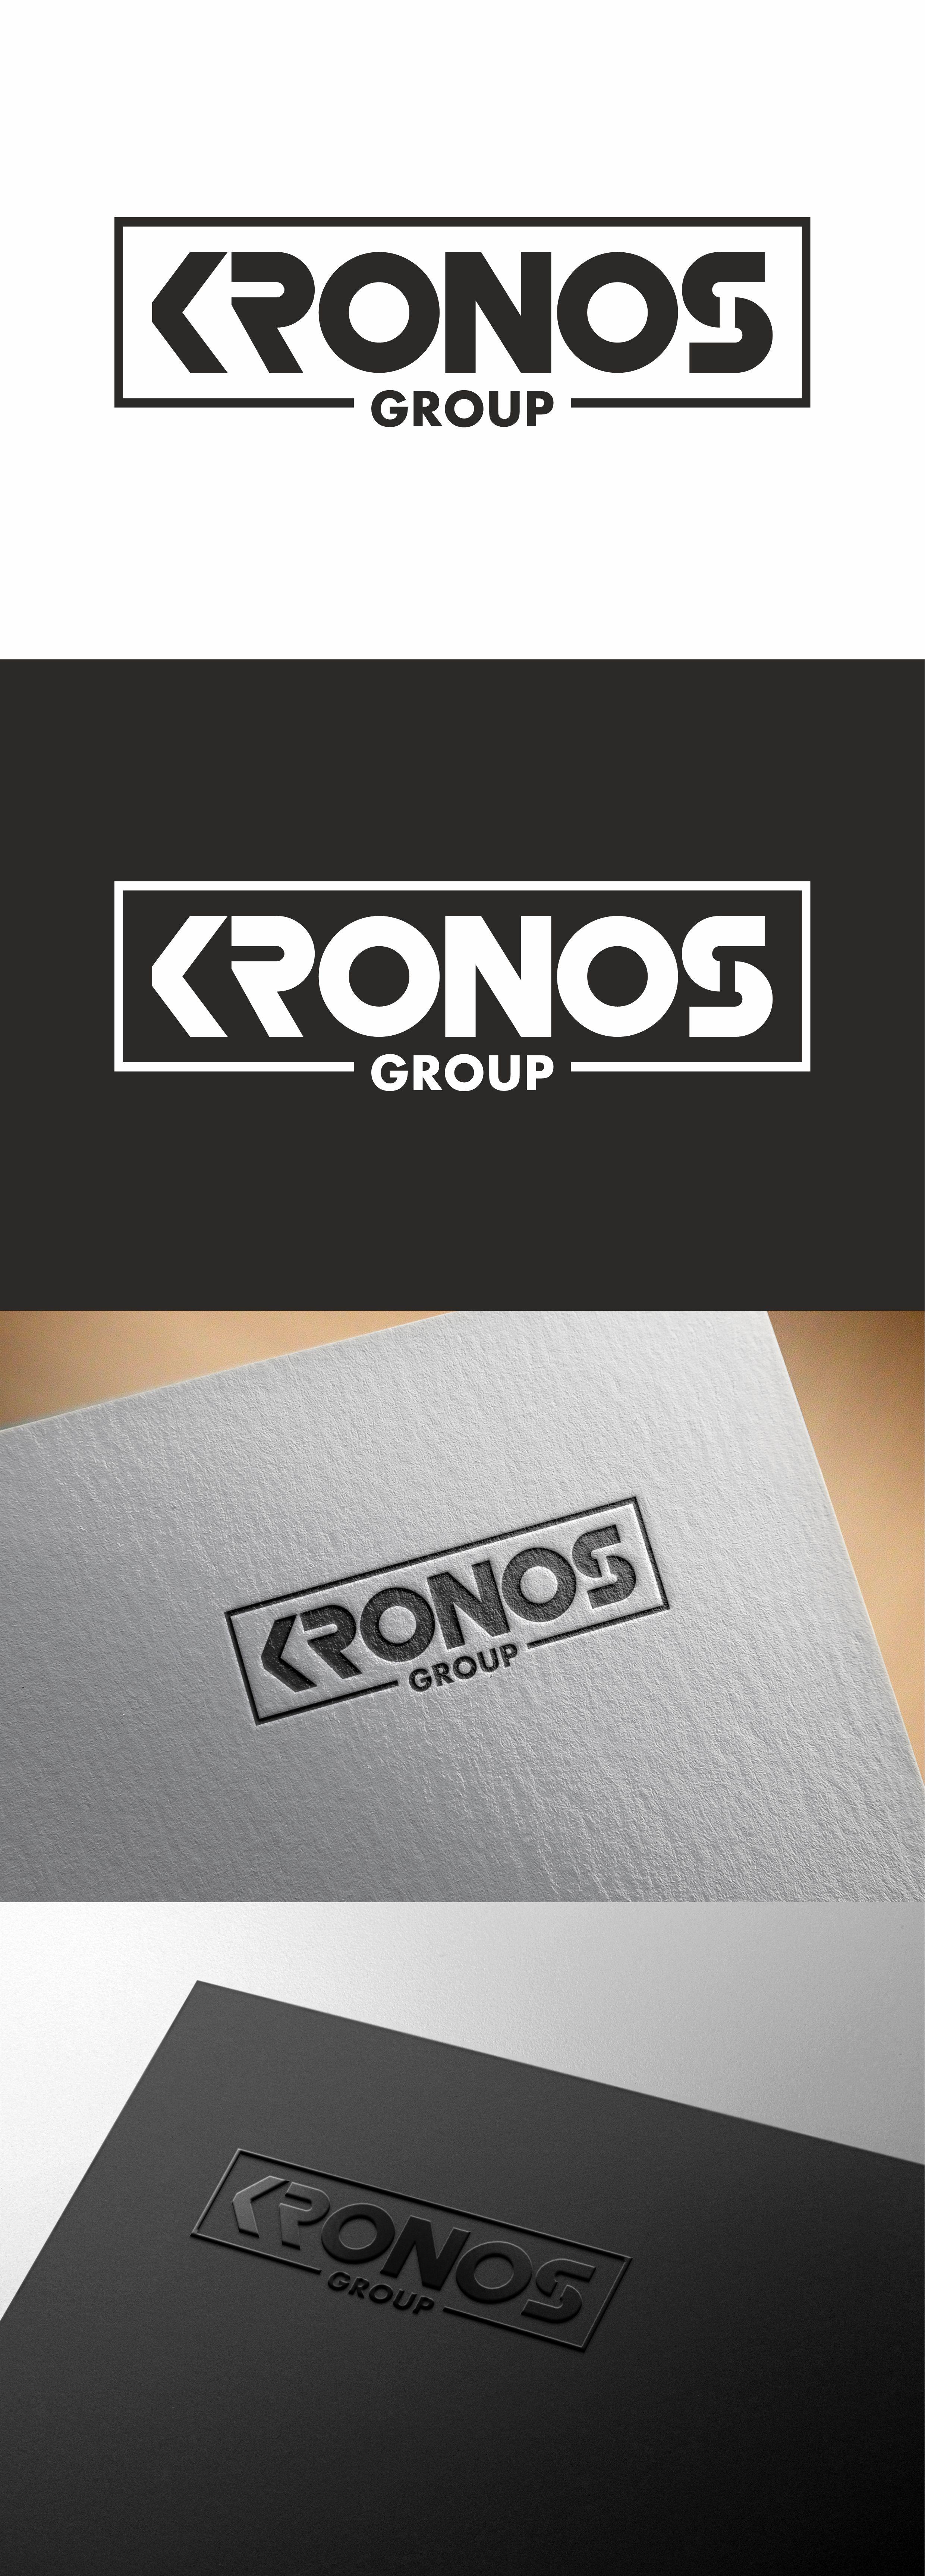 Разработать логотип KRONOS фото f_8825fb0280da40bd.jpg